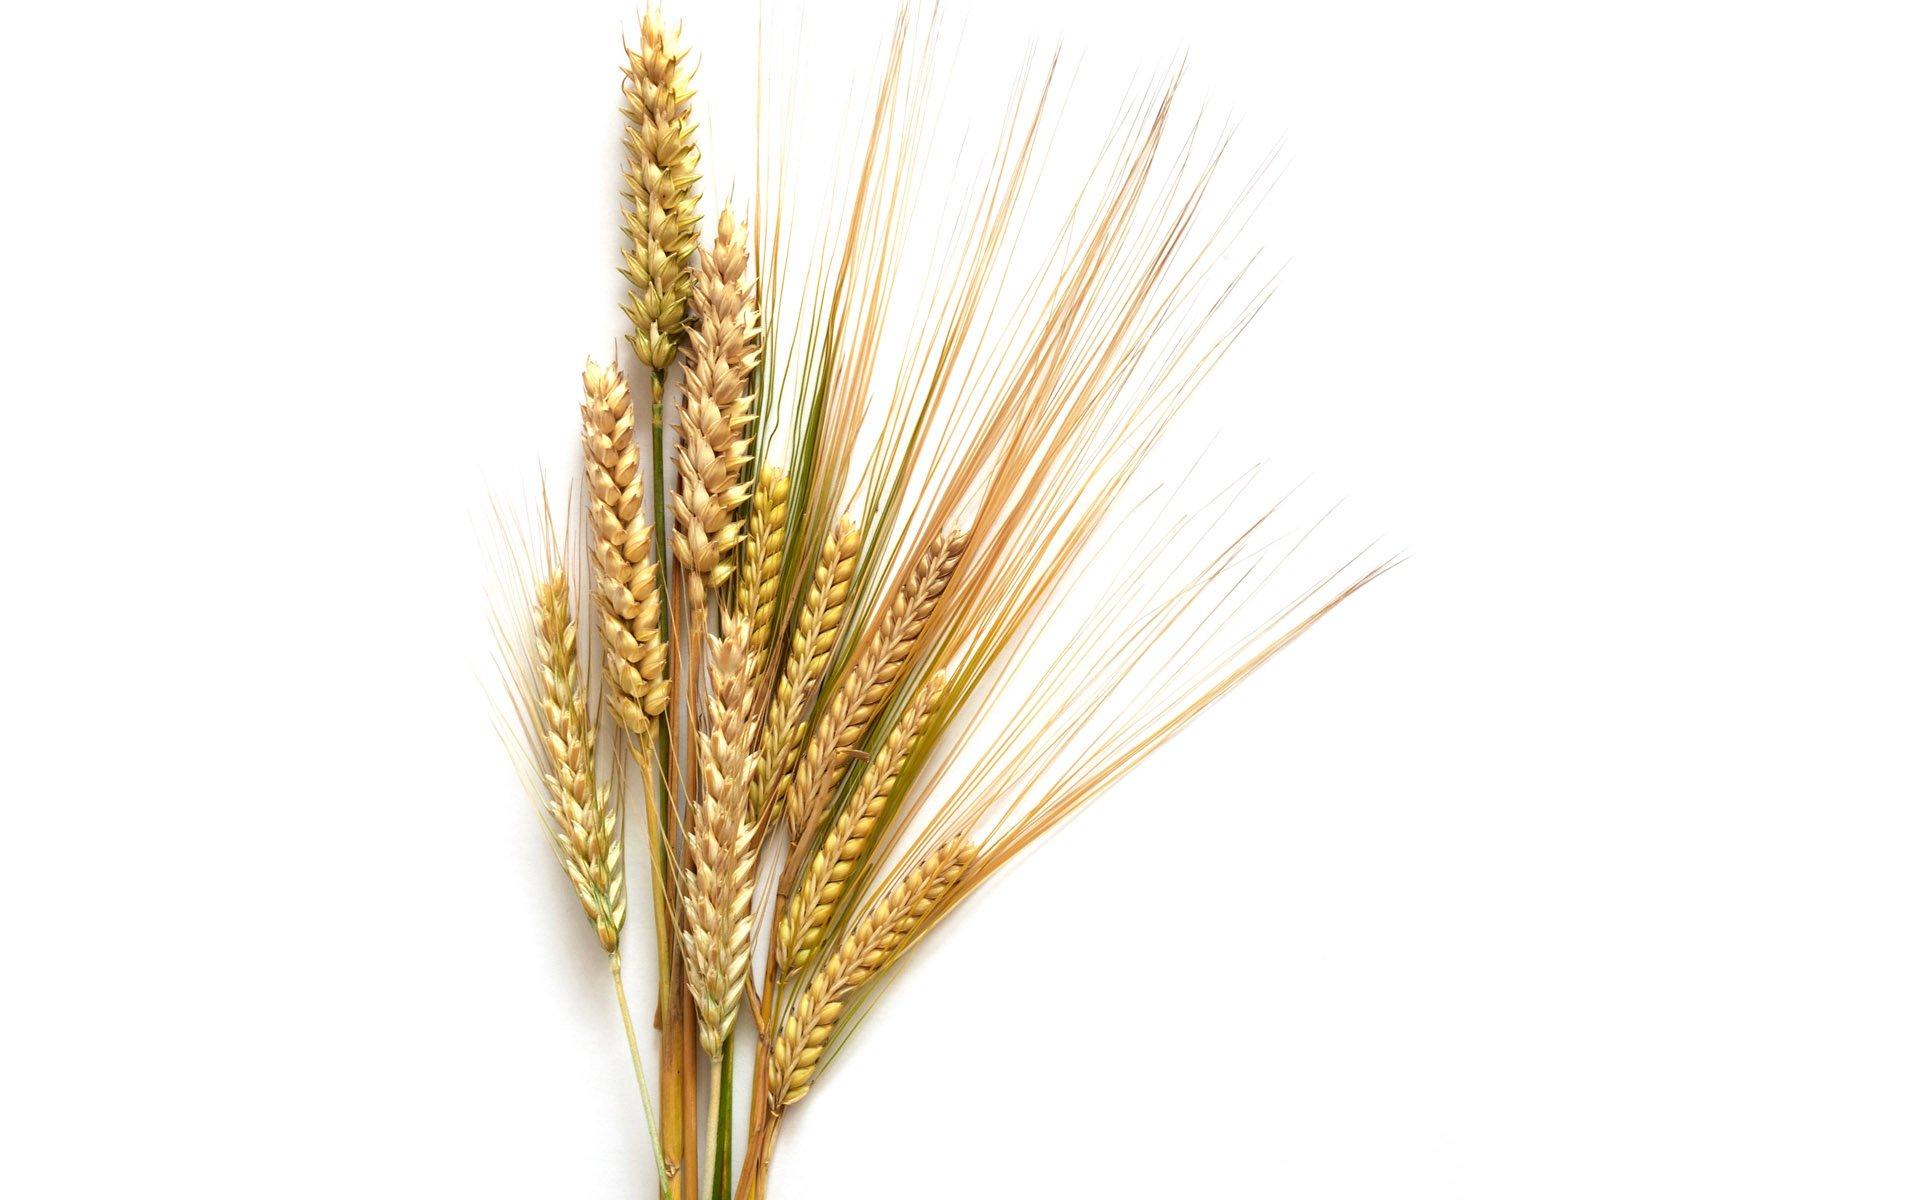 Wheat_001003.jpg